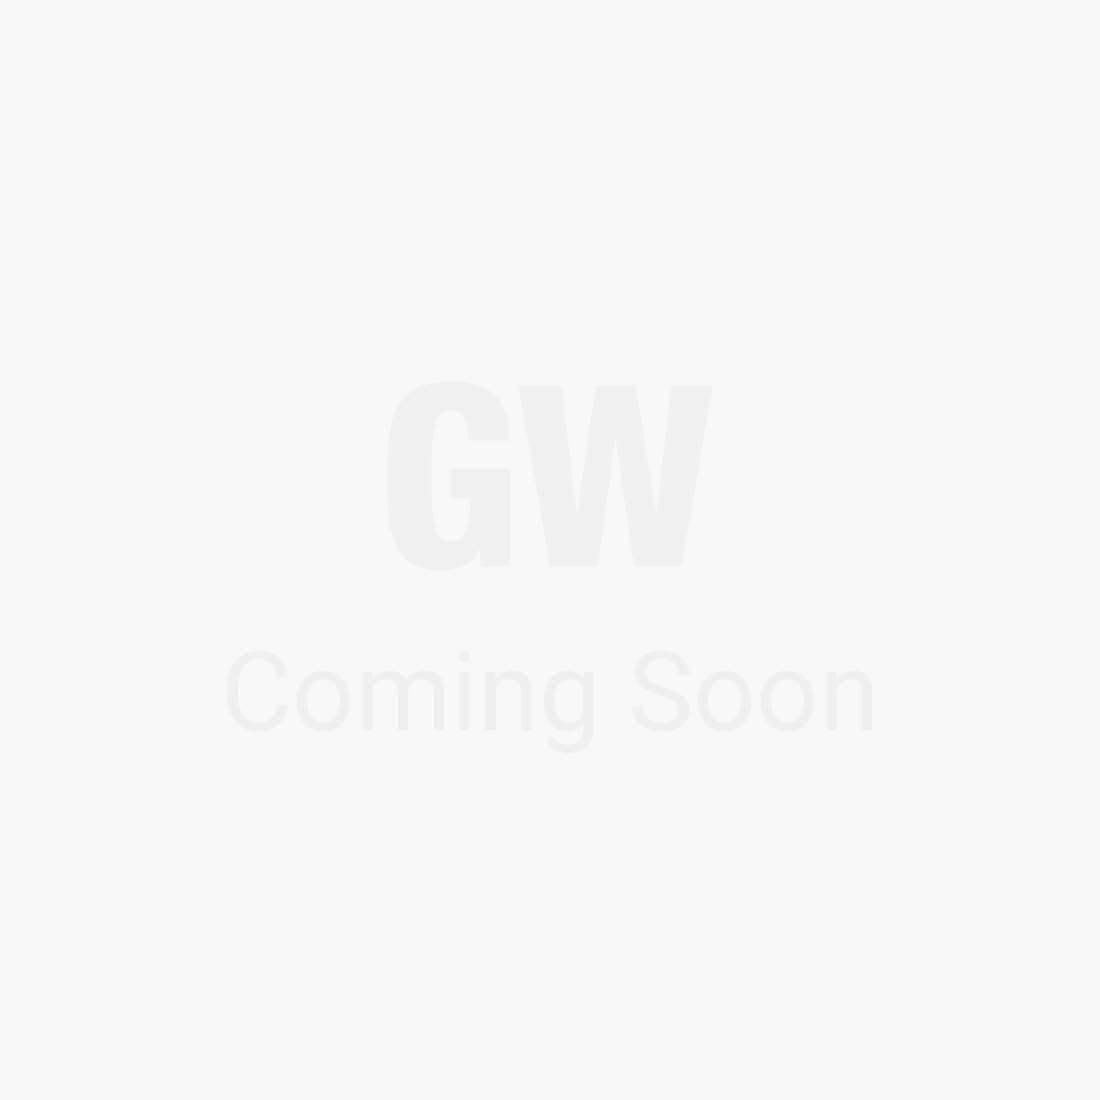 Hugo Rectangle Cushion